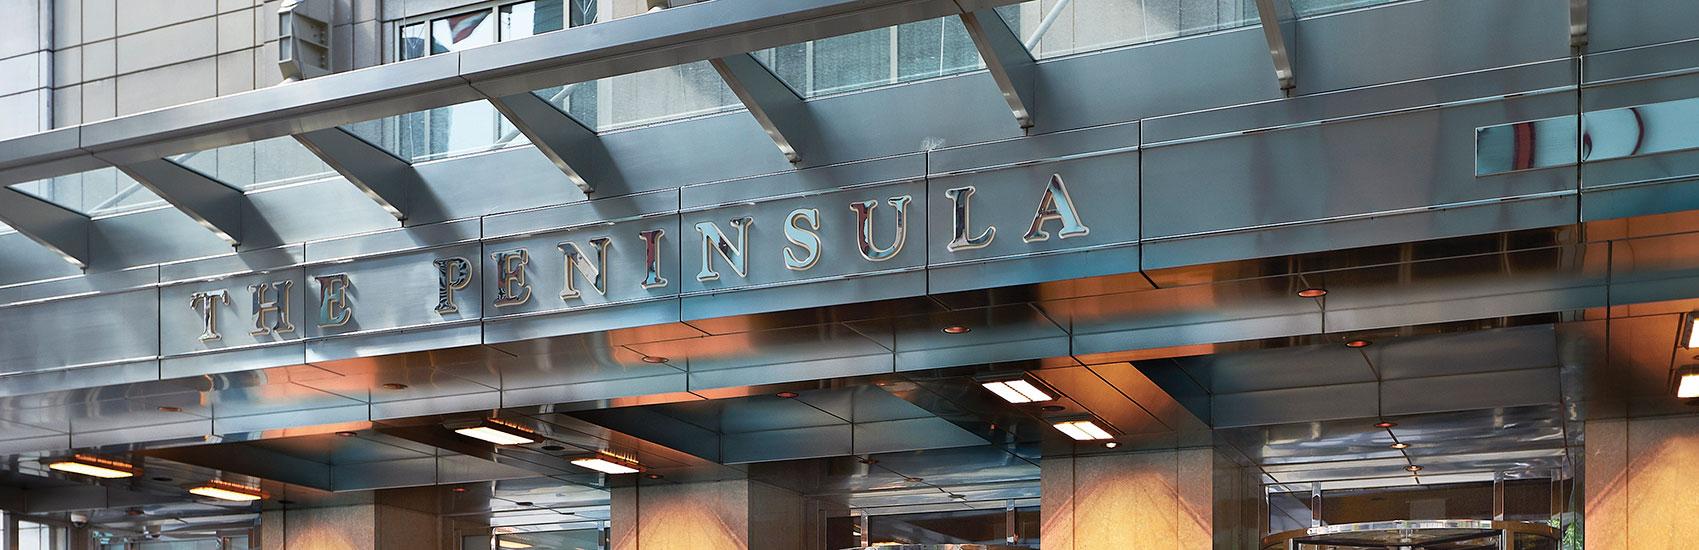 The Peninsula Chicago 0